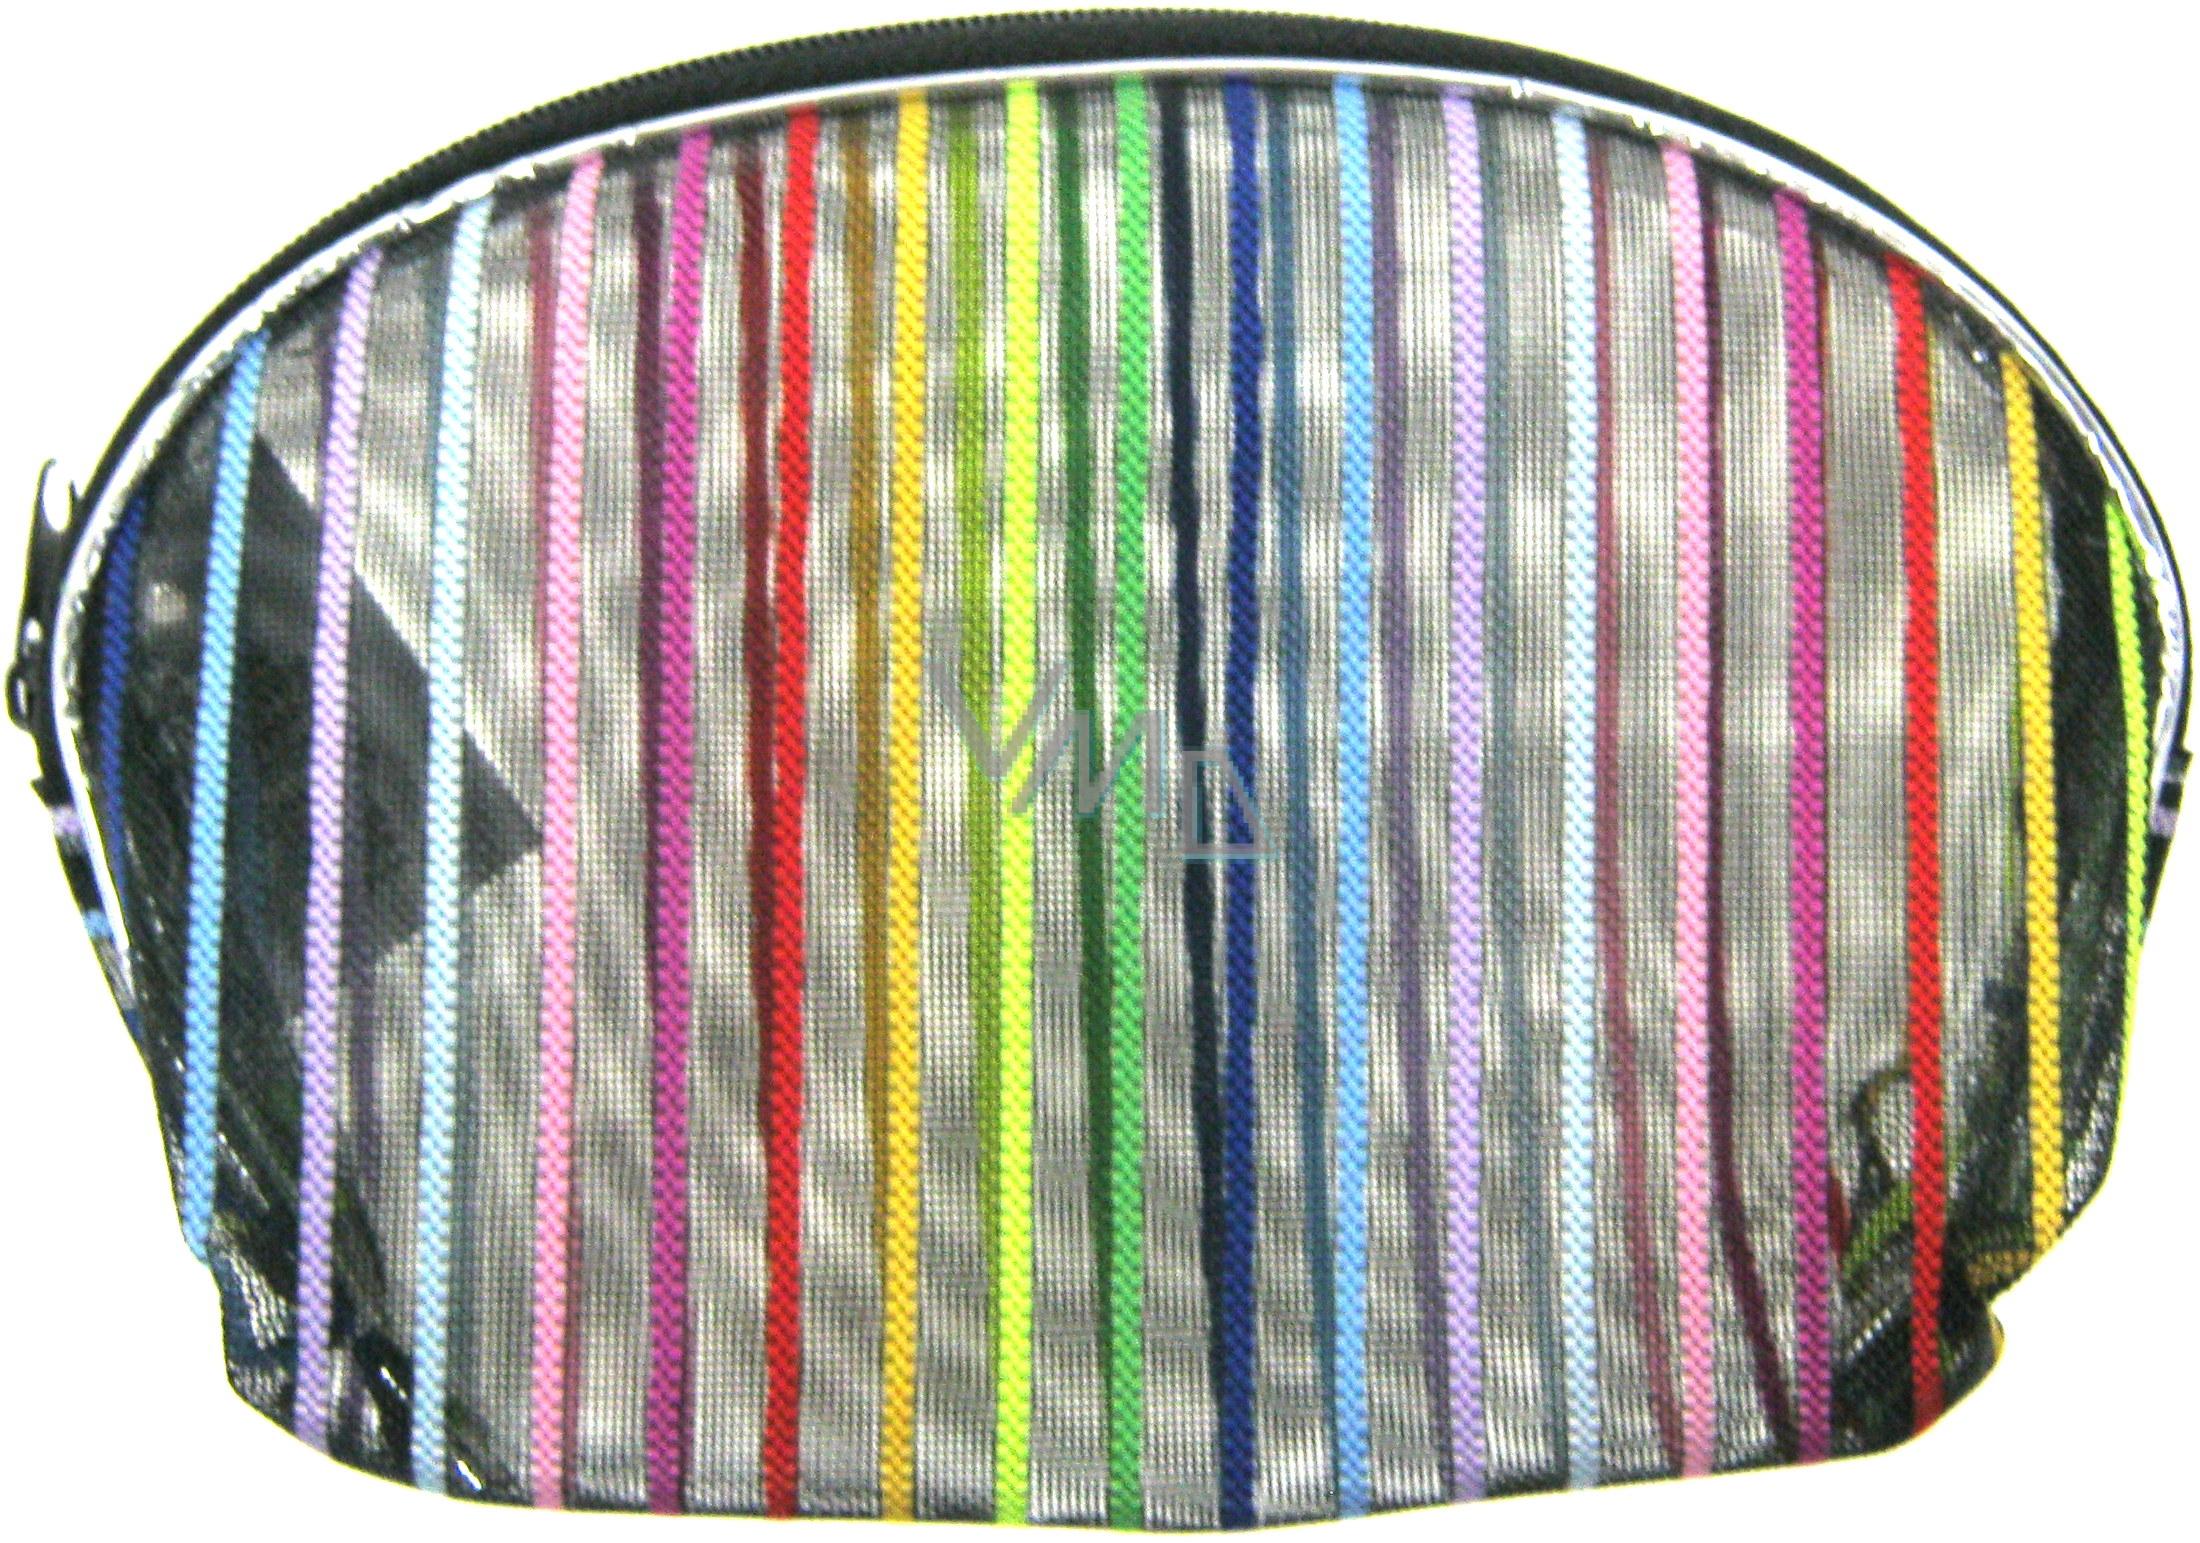 Etue Průhledná - barevný proužek 7 x 8 x 1 cm 70150 1 kus